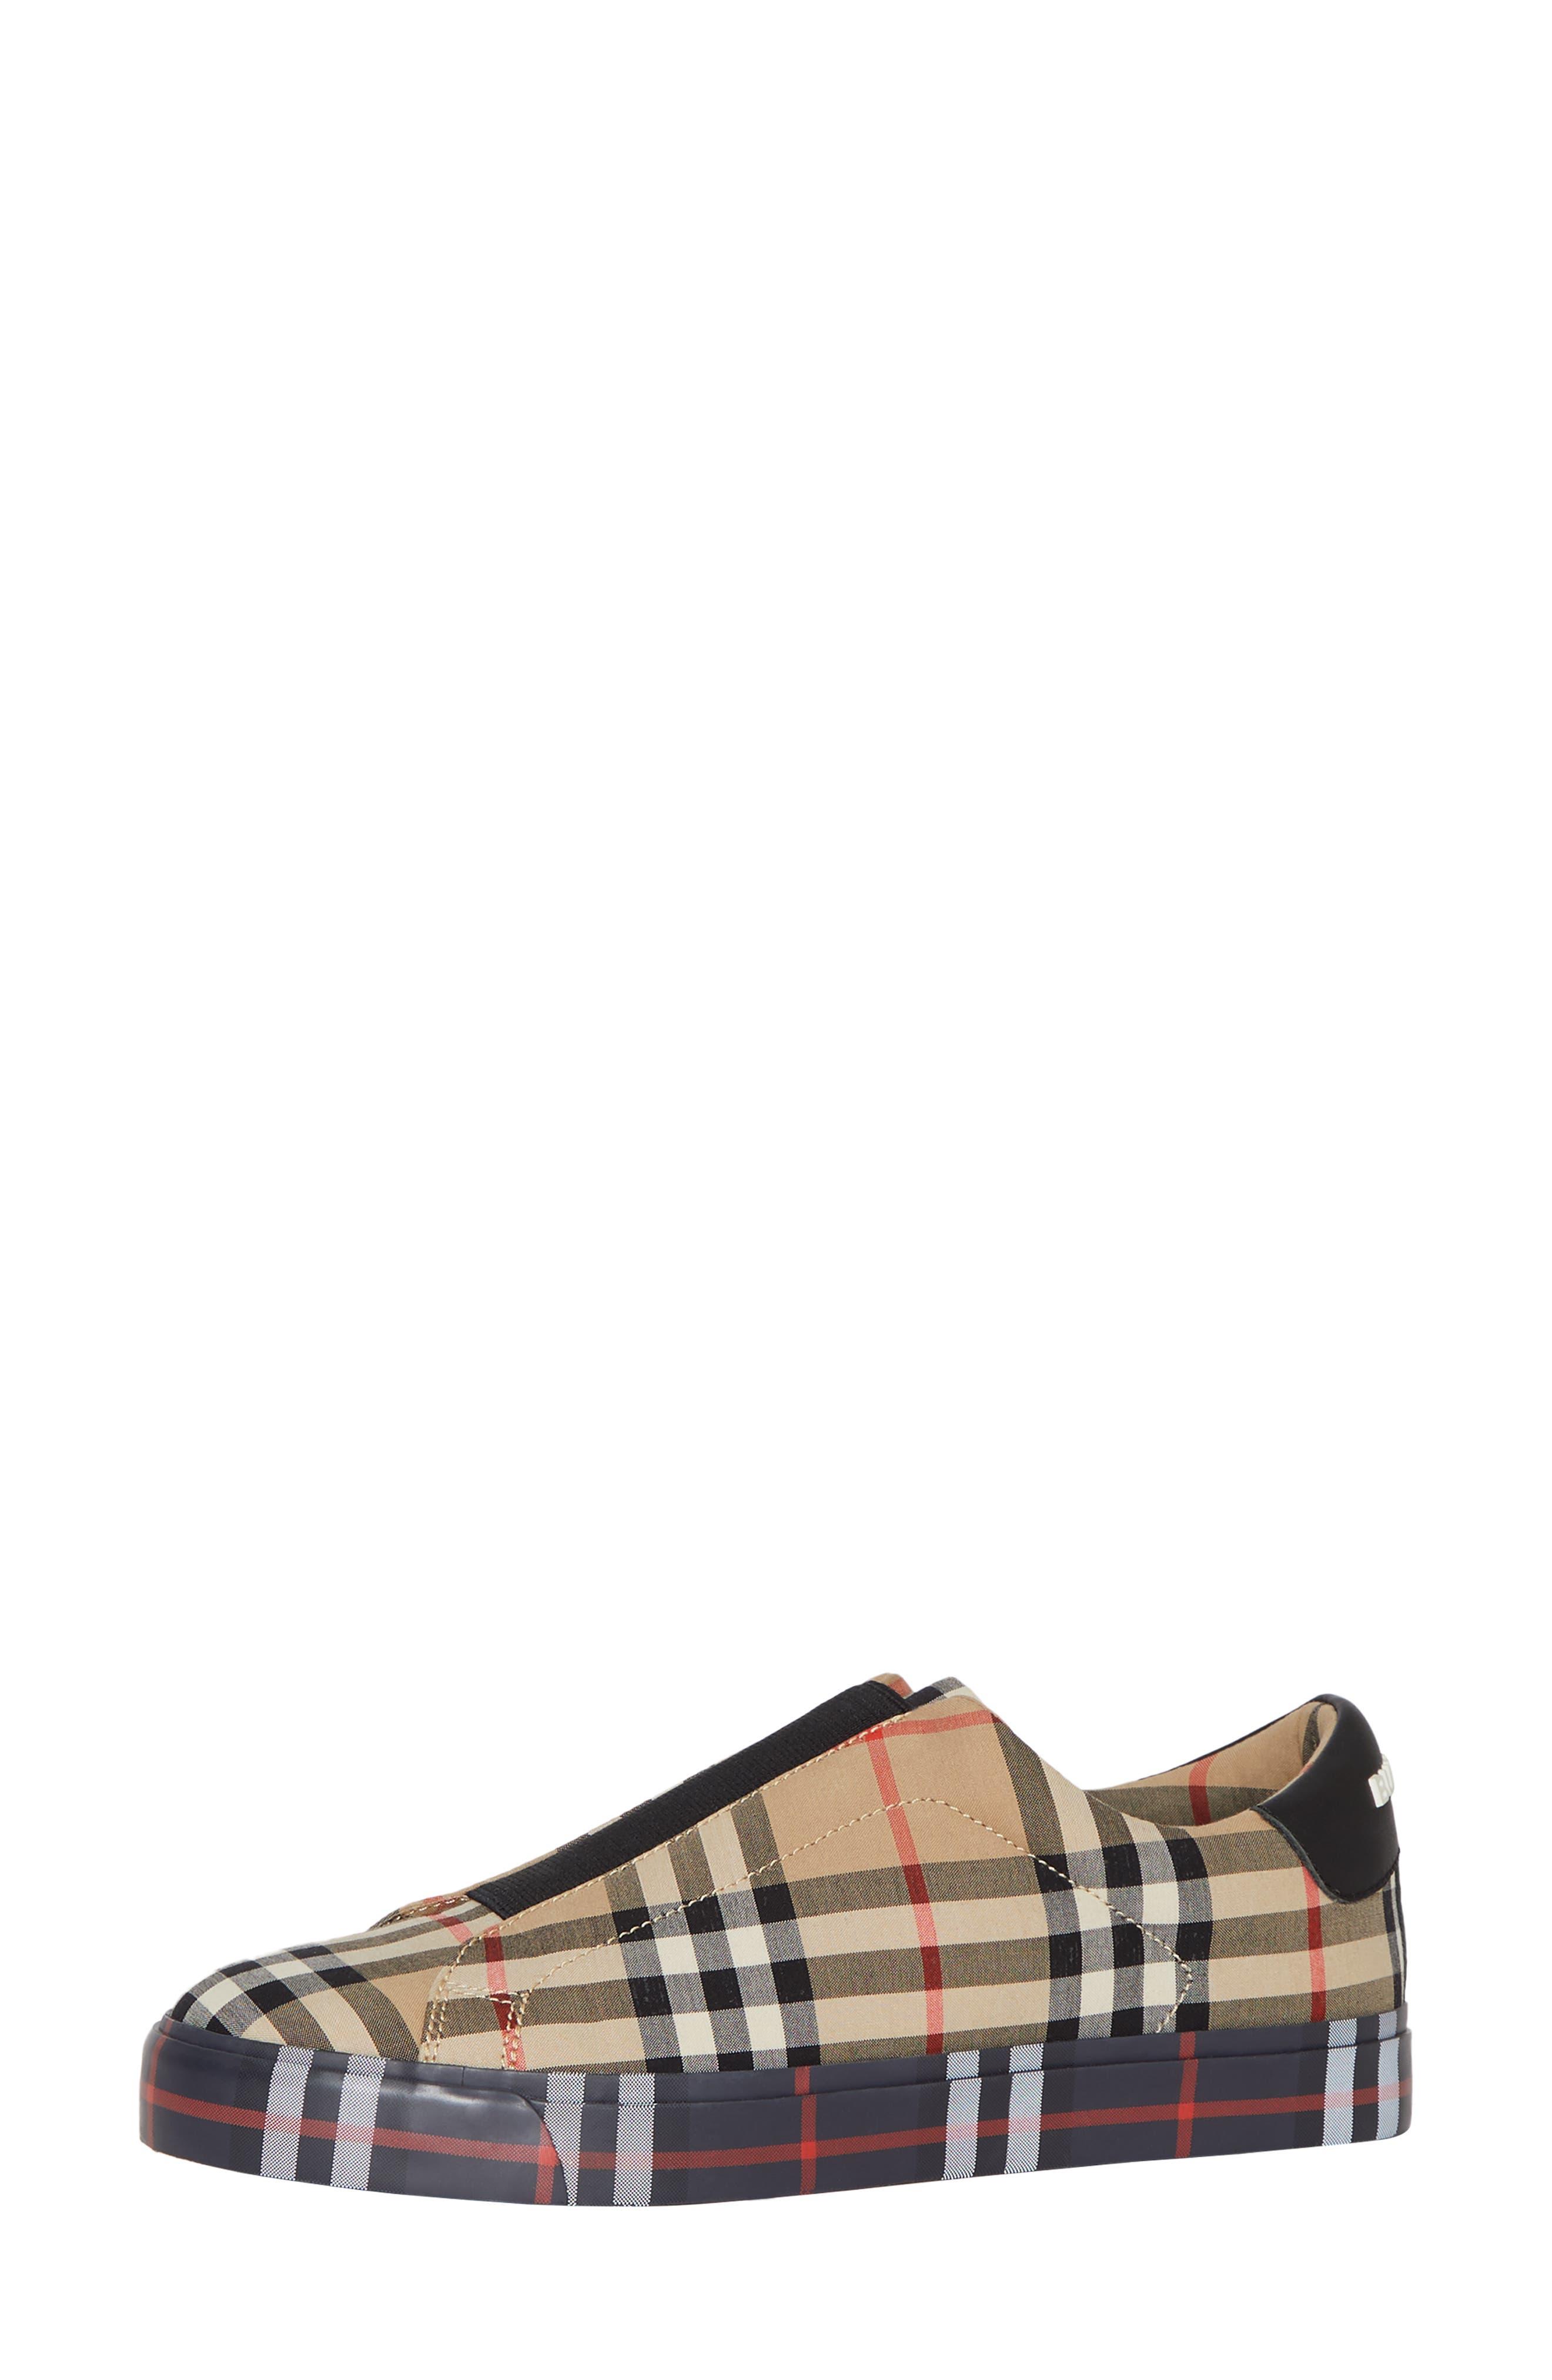 BURBERRY, Markham Vintage Check Slip-On Sneaker, Alternate thumbnail 8, color, BEIGE PLAID